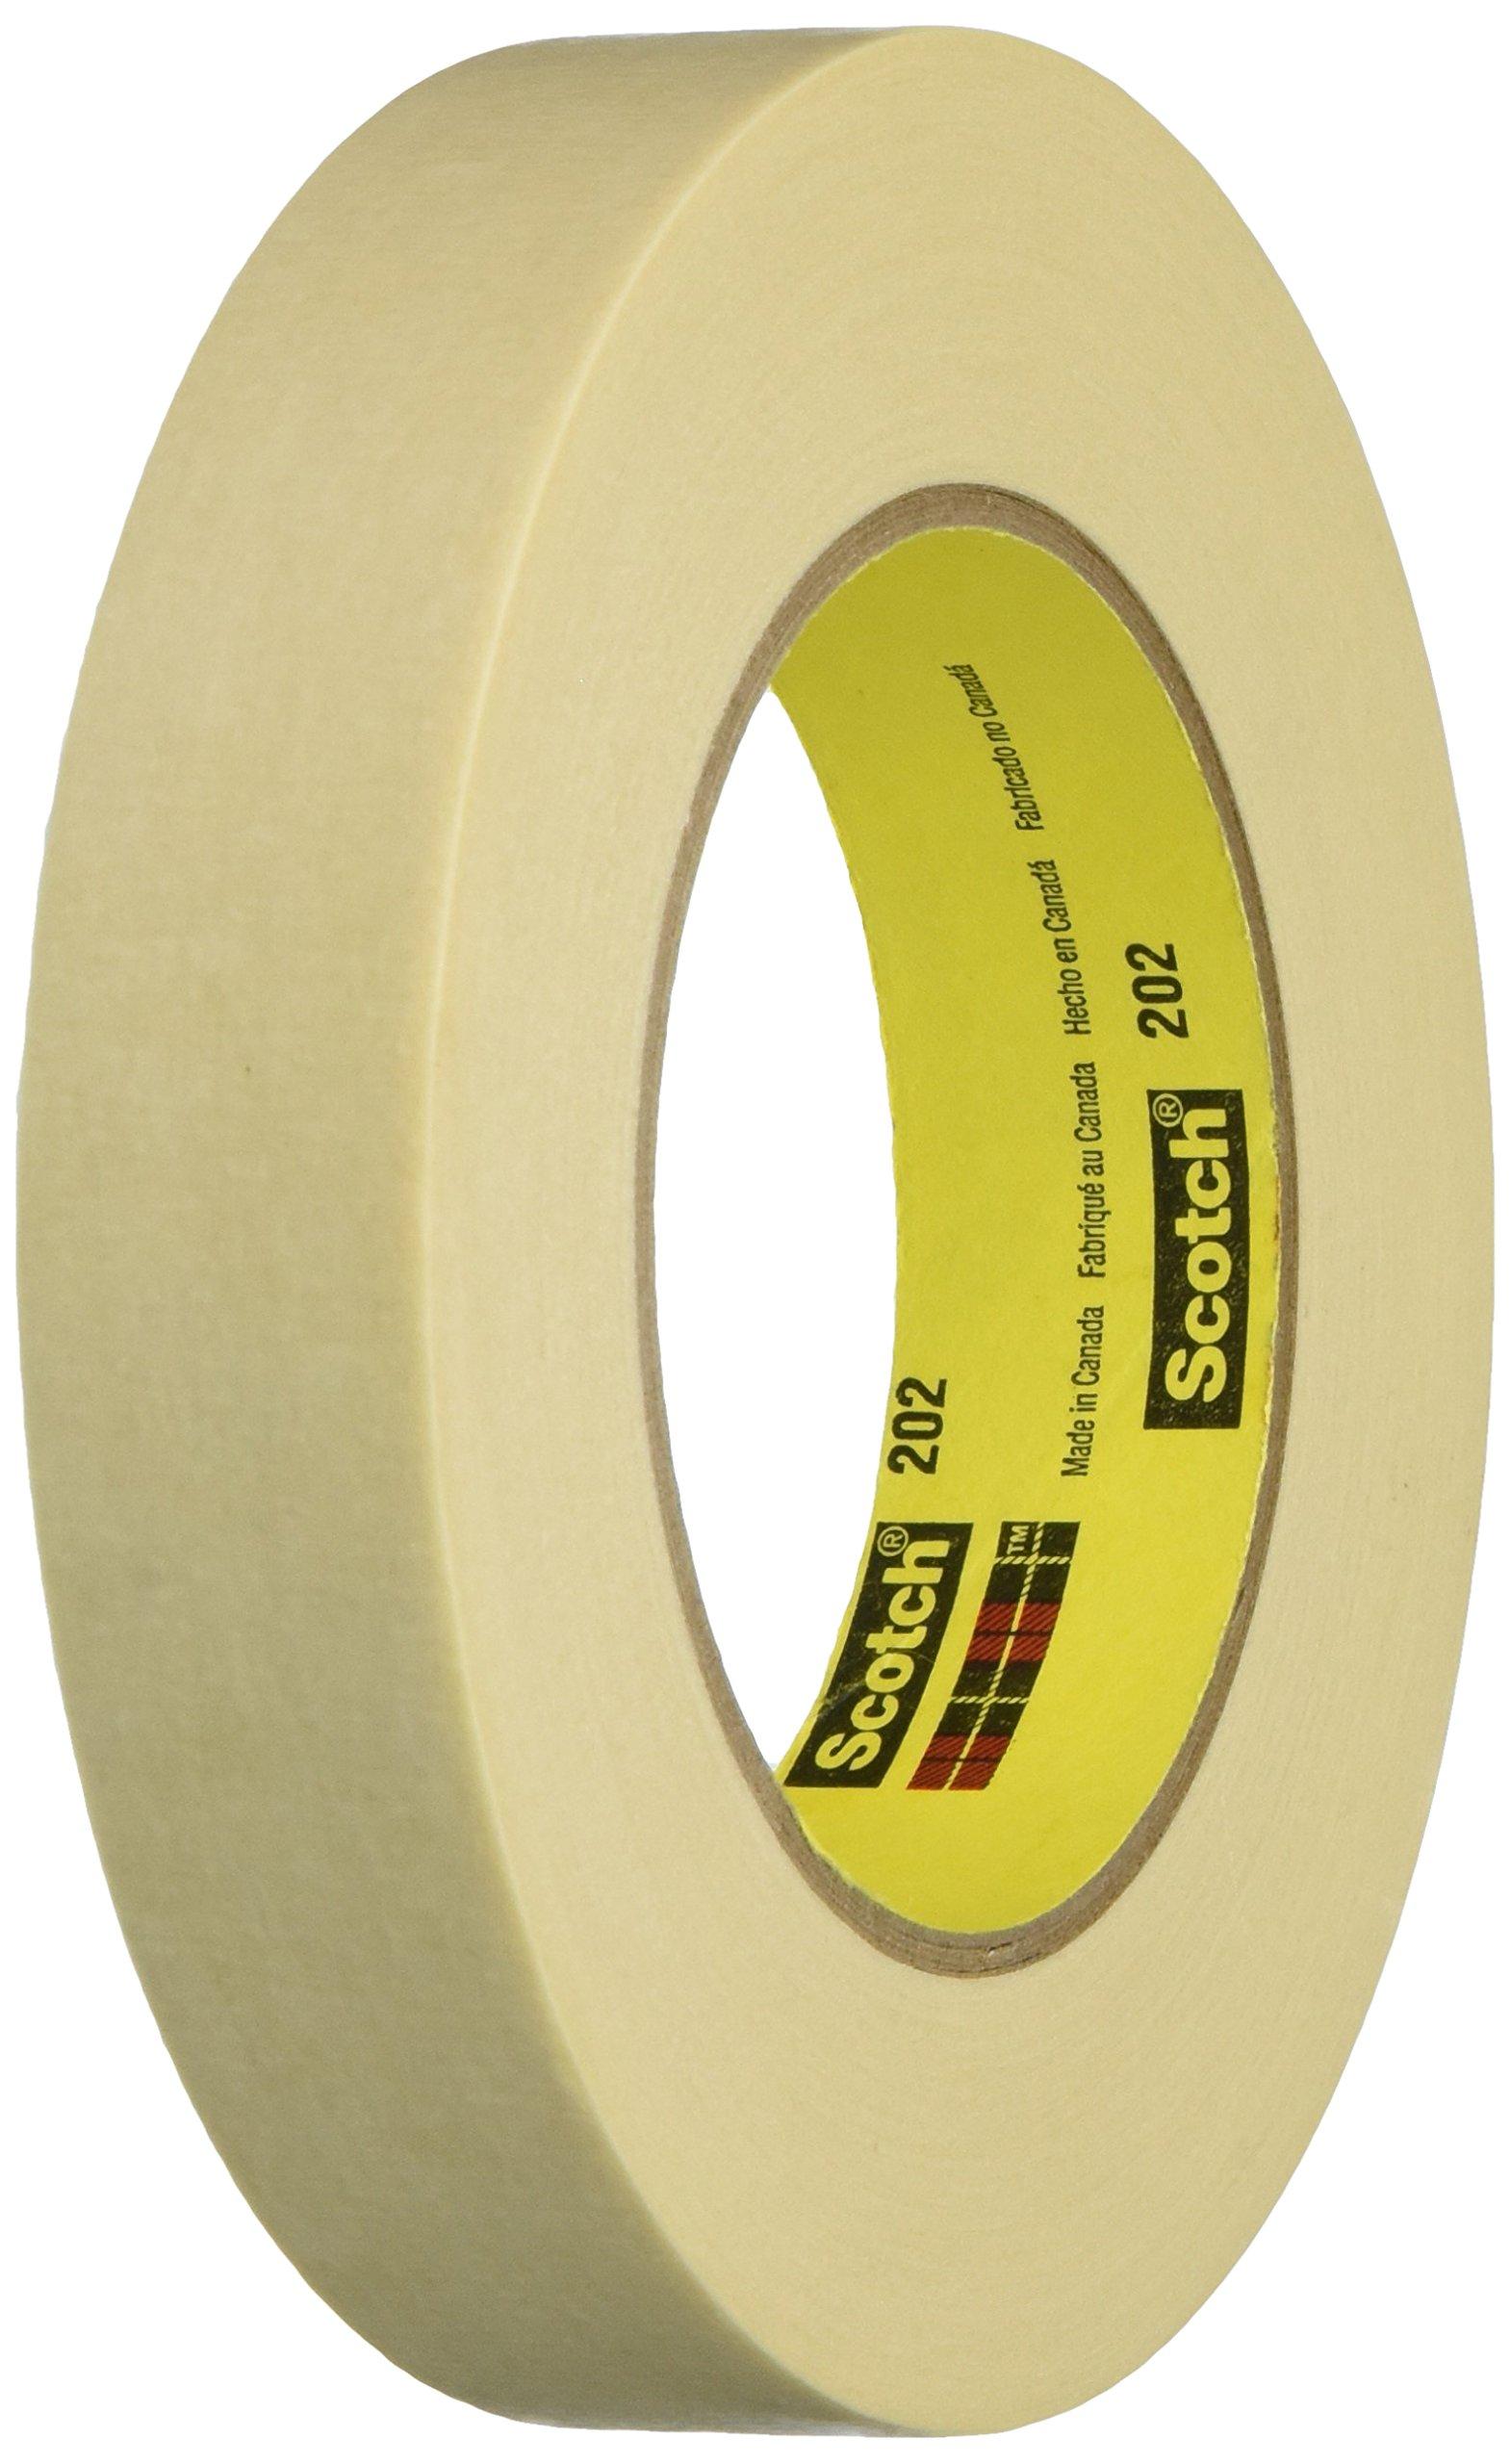 Scotch Masking Tape, 1 inch x 60 yards, Tan, 1 Roll of Tape (202)